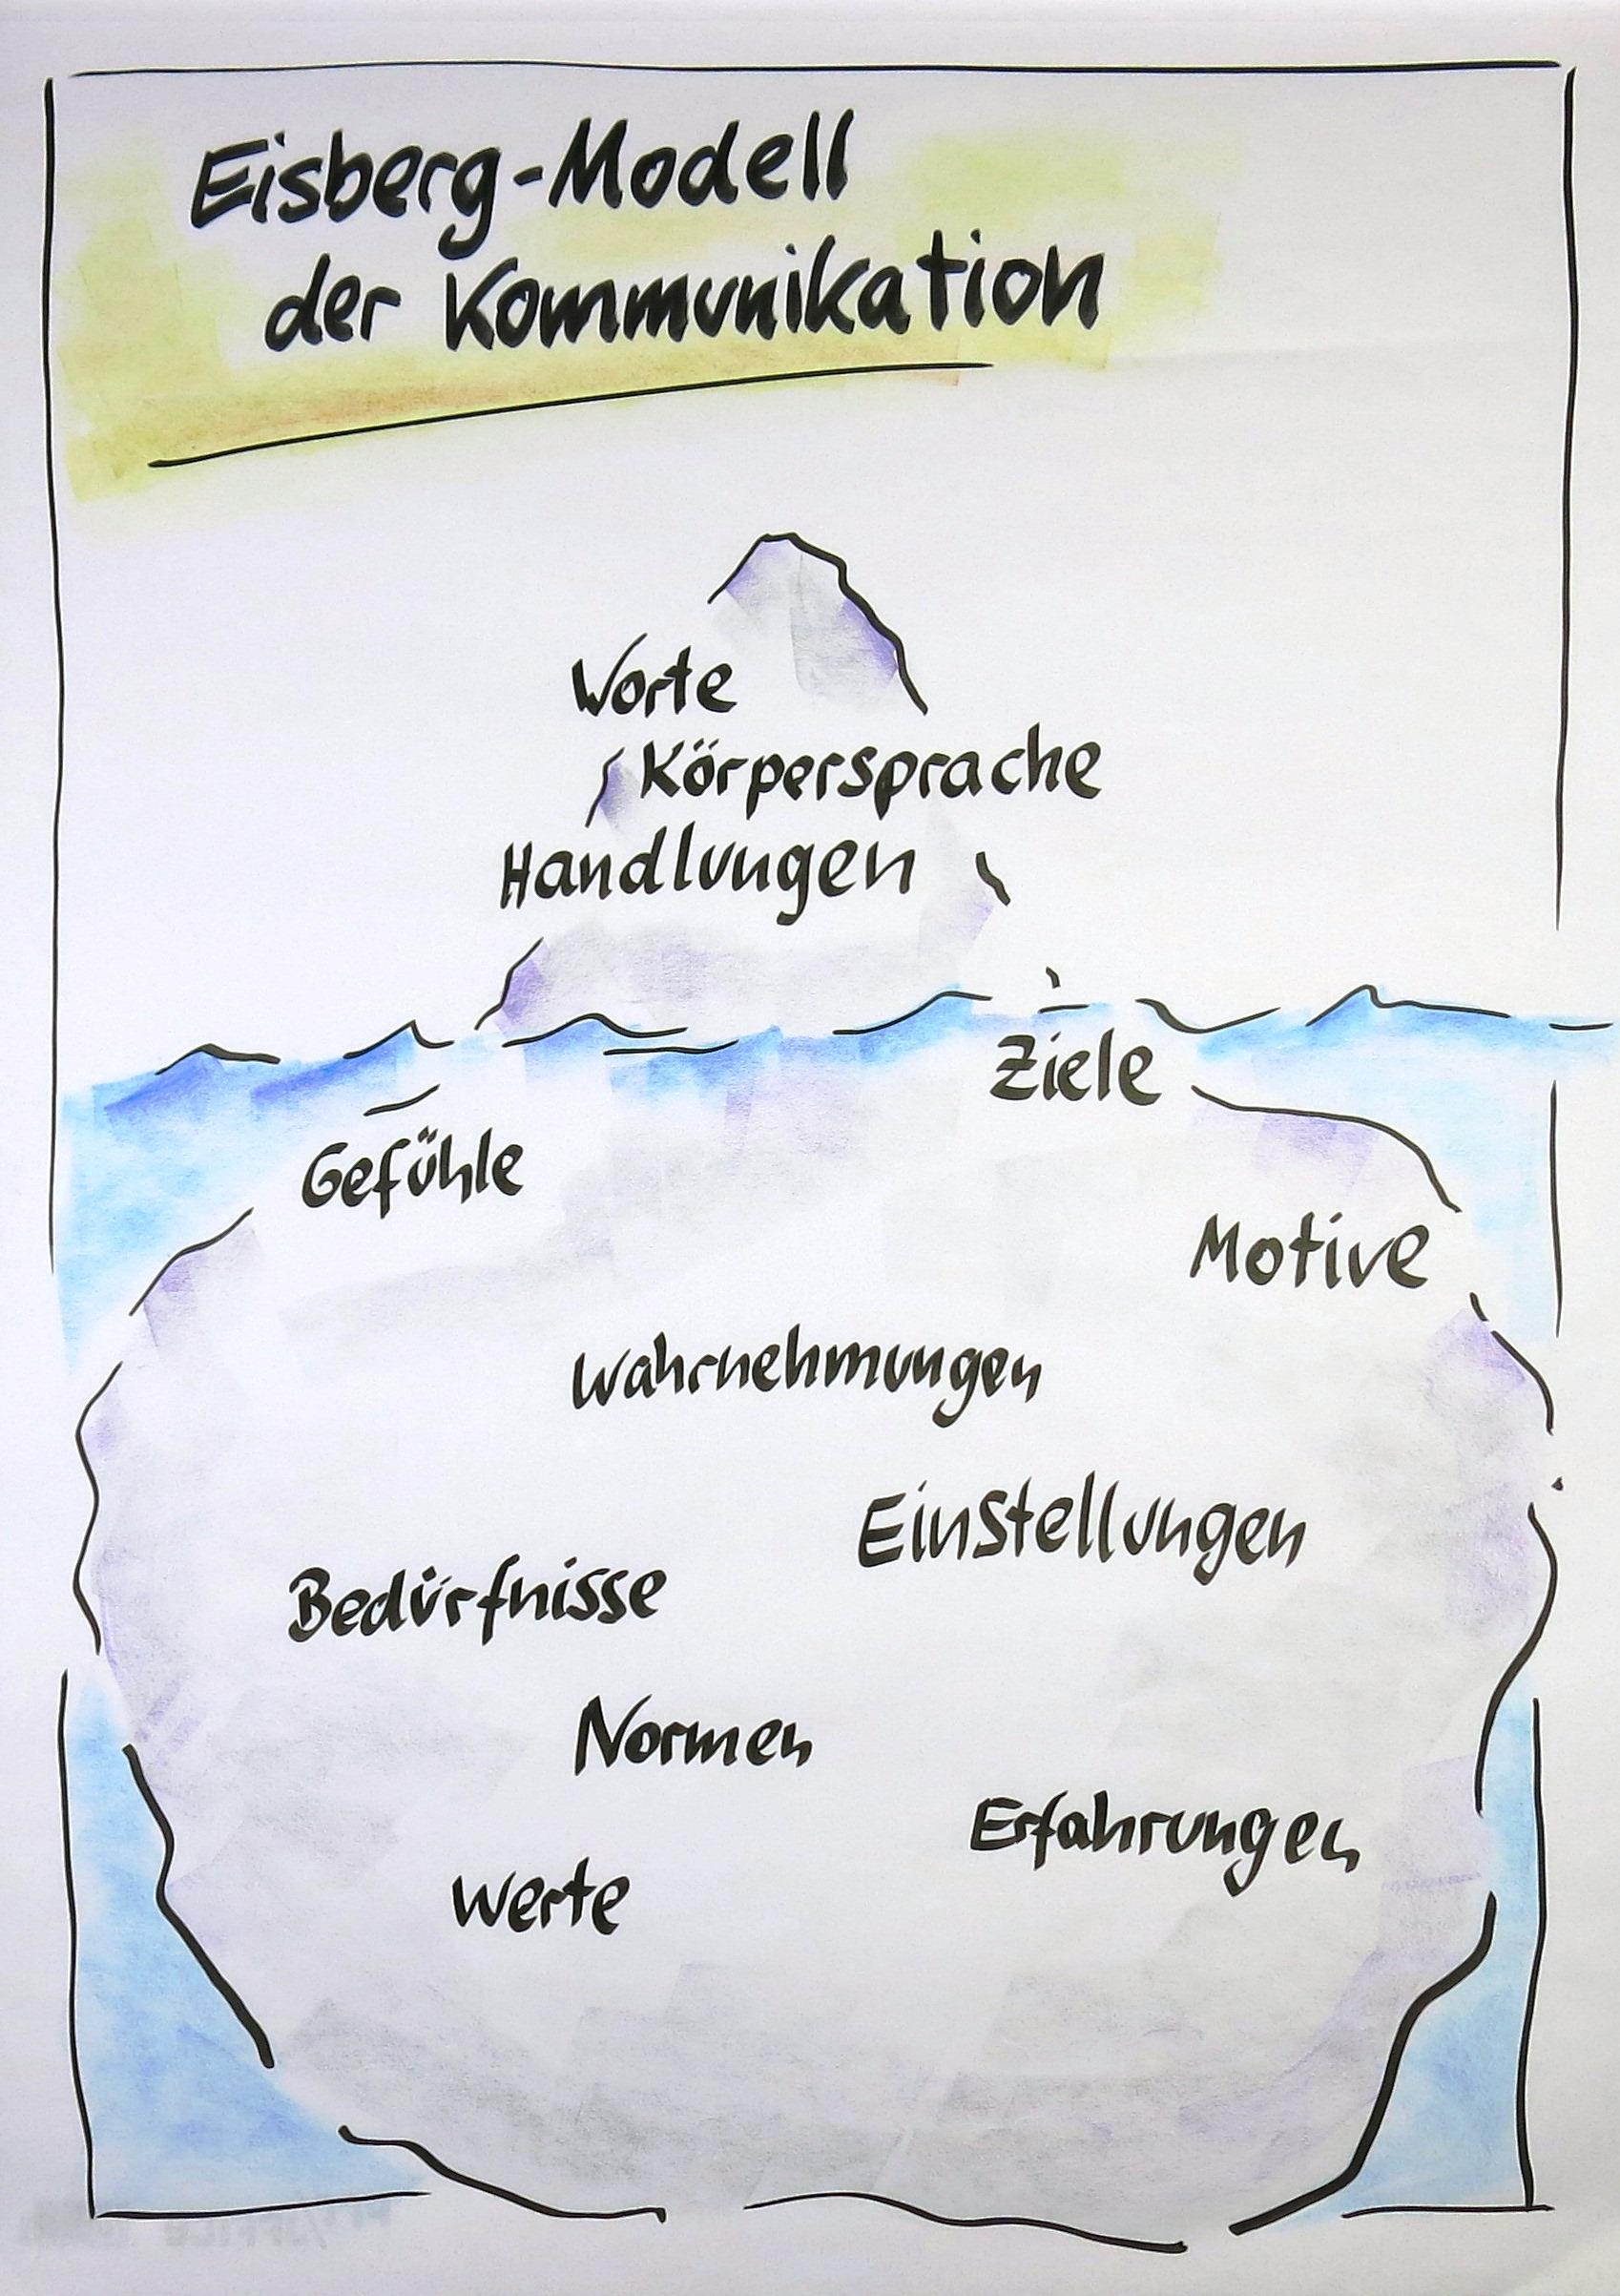 - Eisberg -